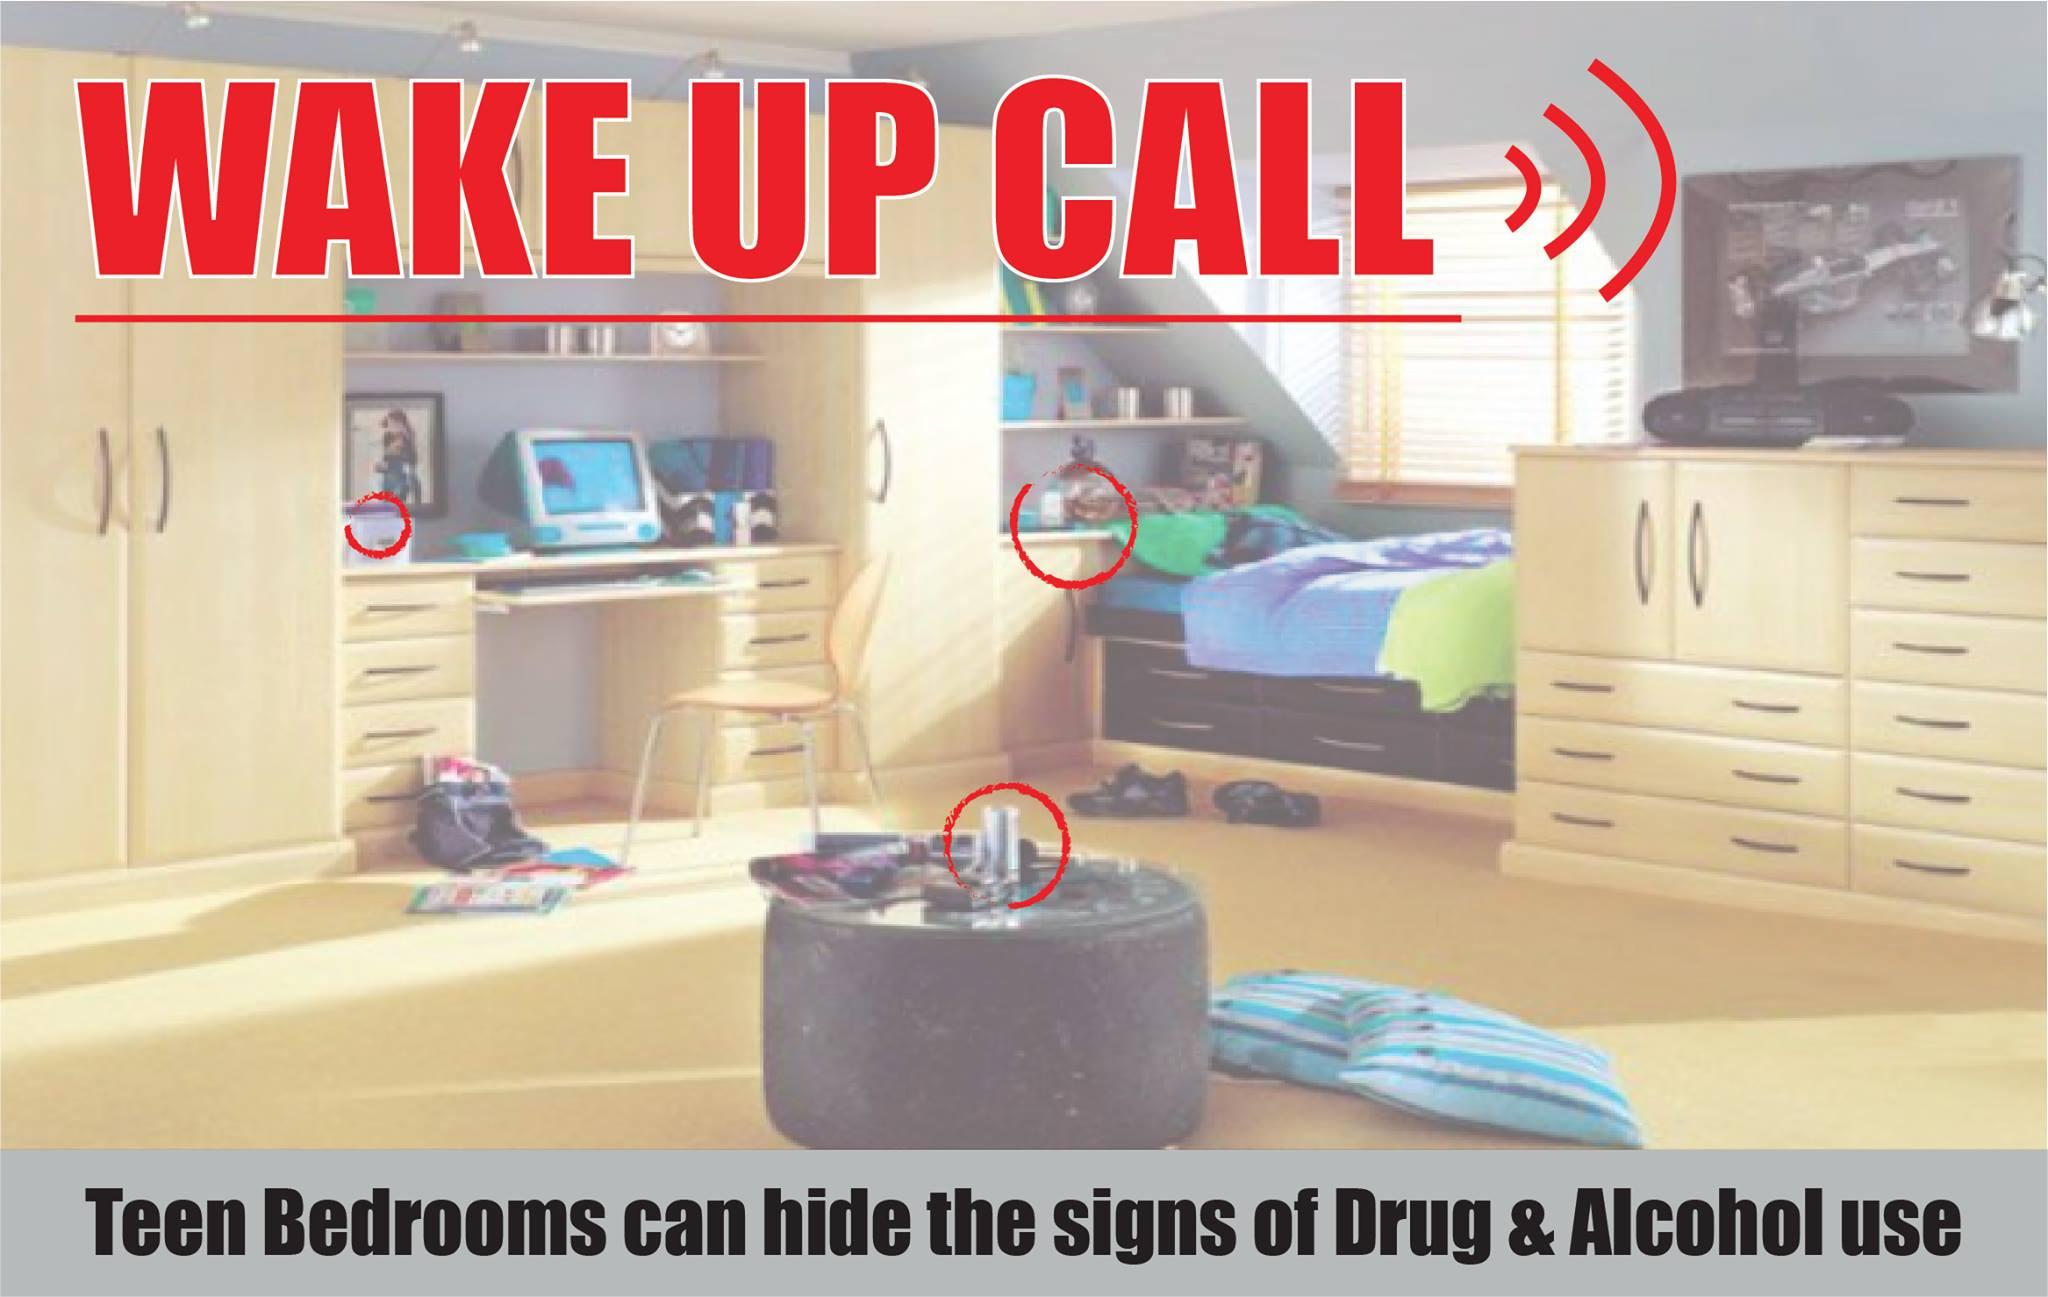 wake up call FB banner.jpg